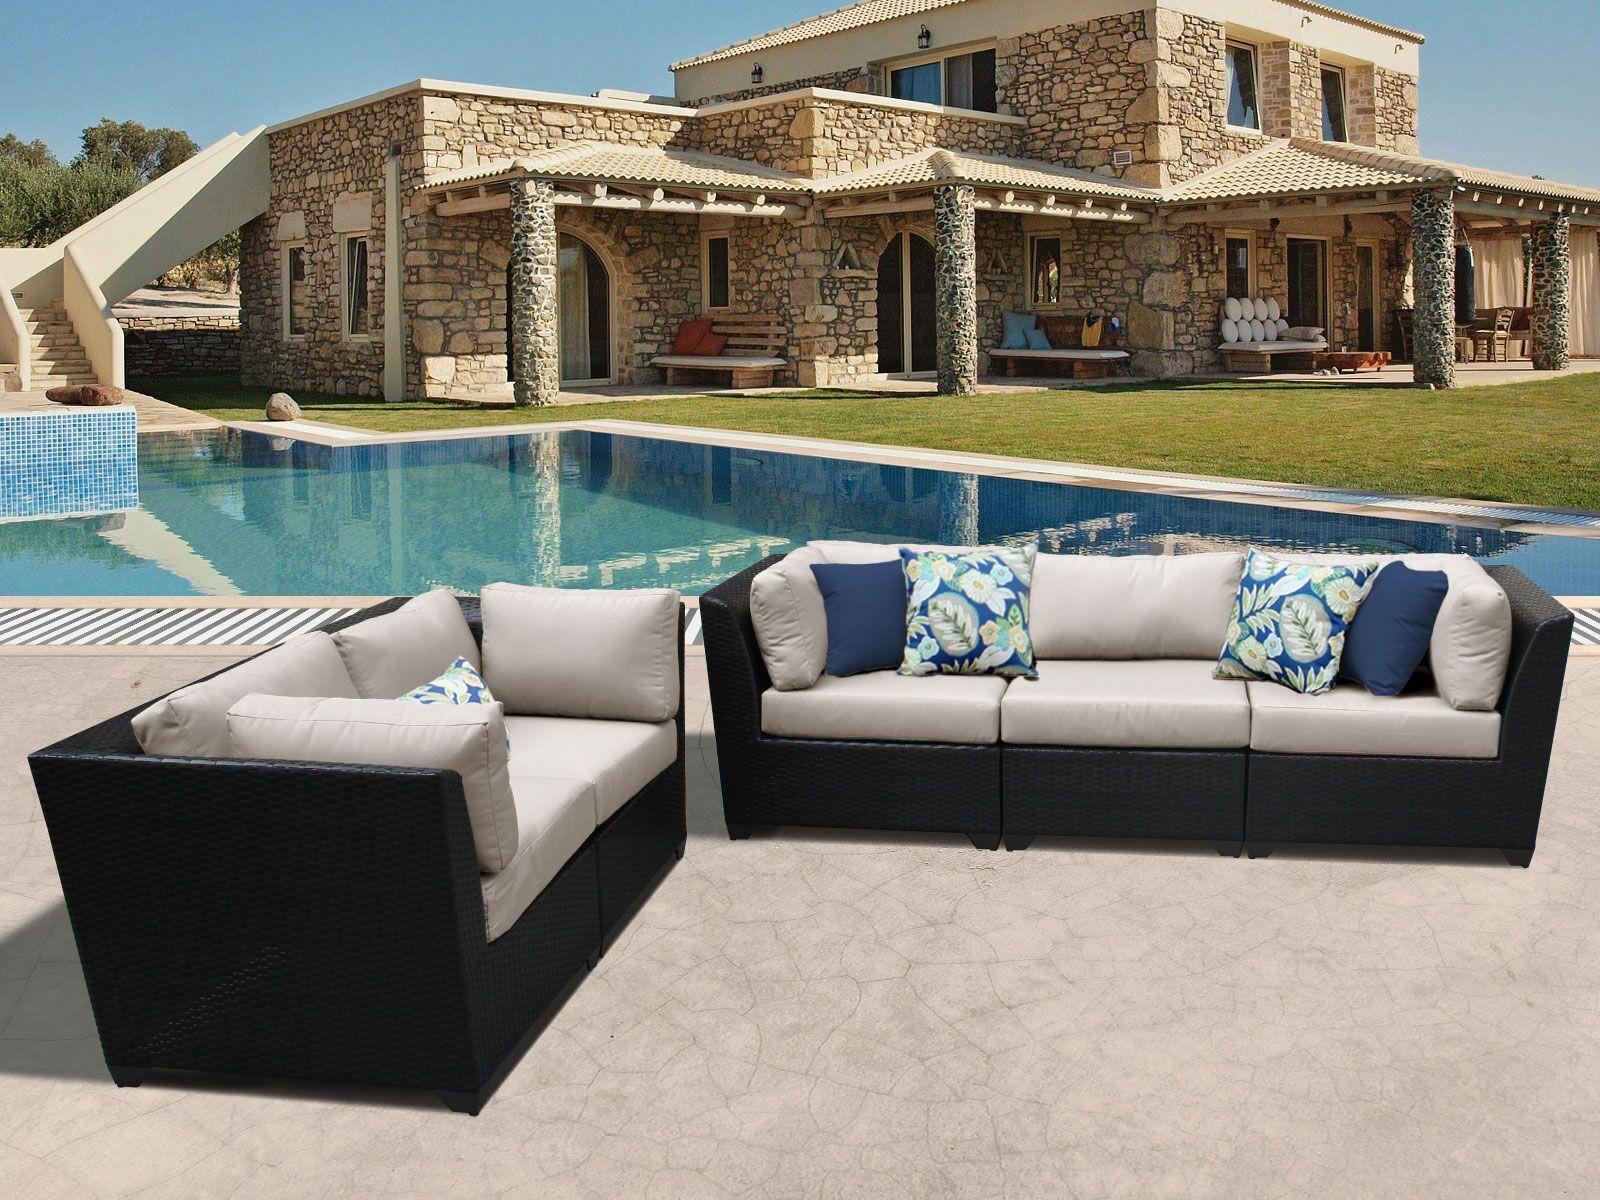 Barbados 5 Piece Sofa Set with Cushions Color: Beige